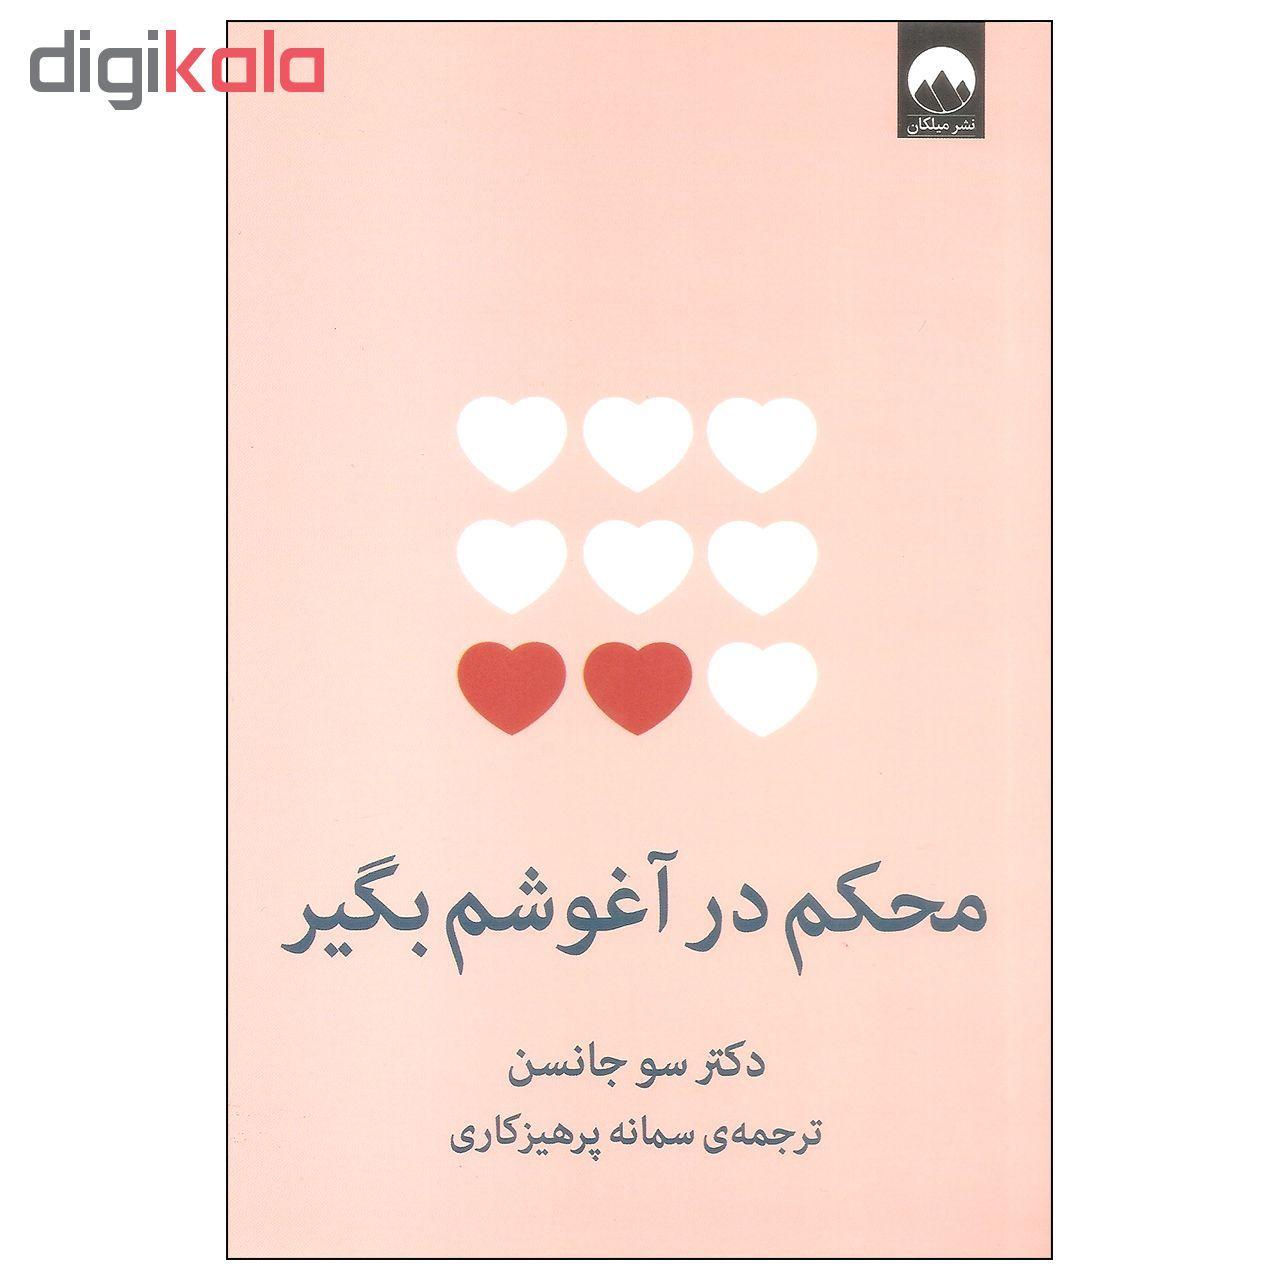 کتاب محکم در آغوشم بگیر اثر دکتر سو جانسن نشر میلکان main 1 1